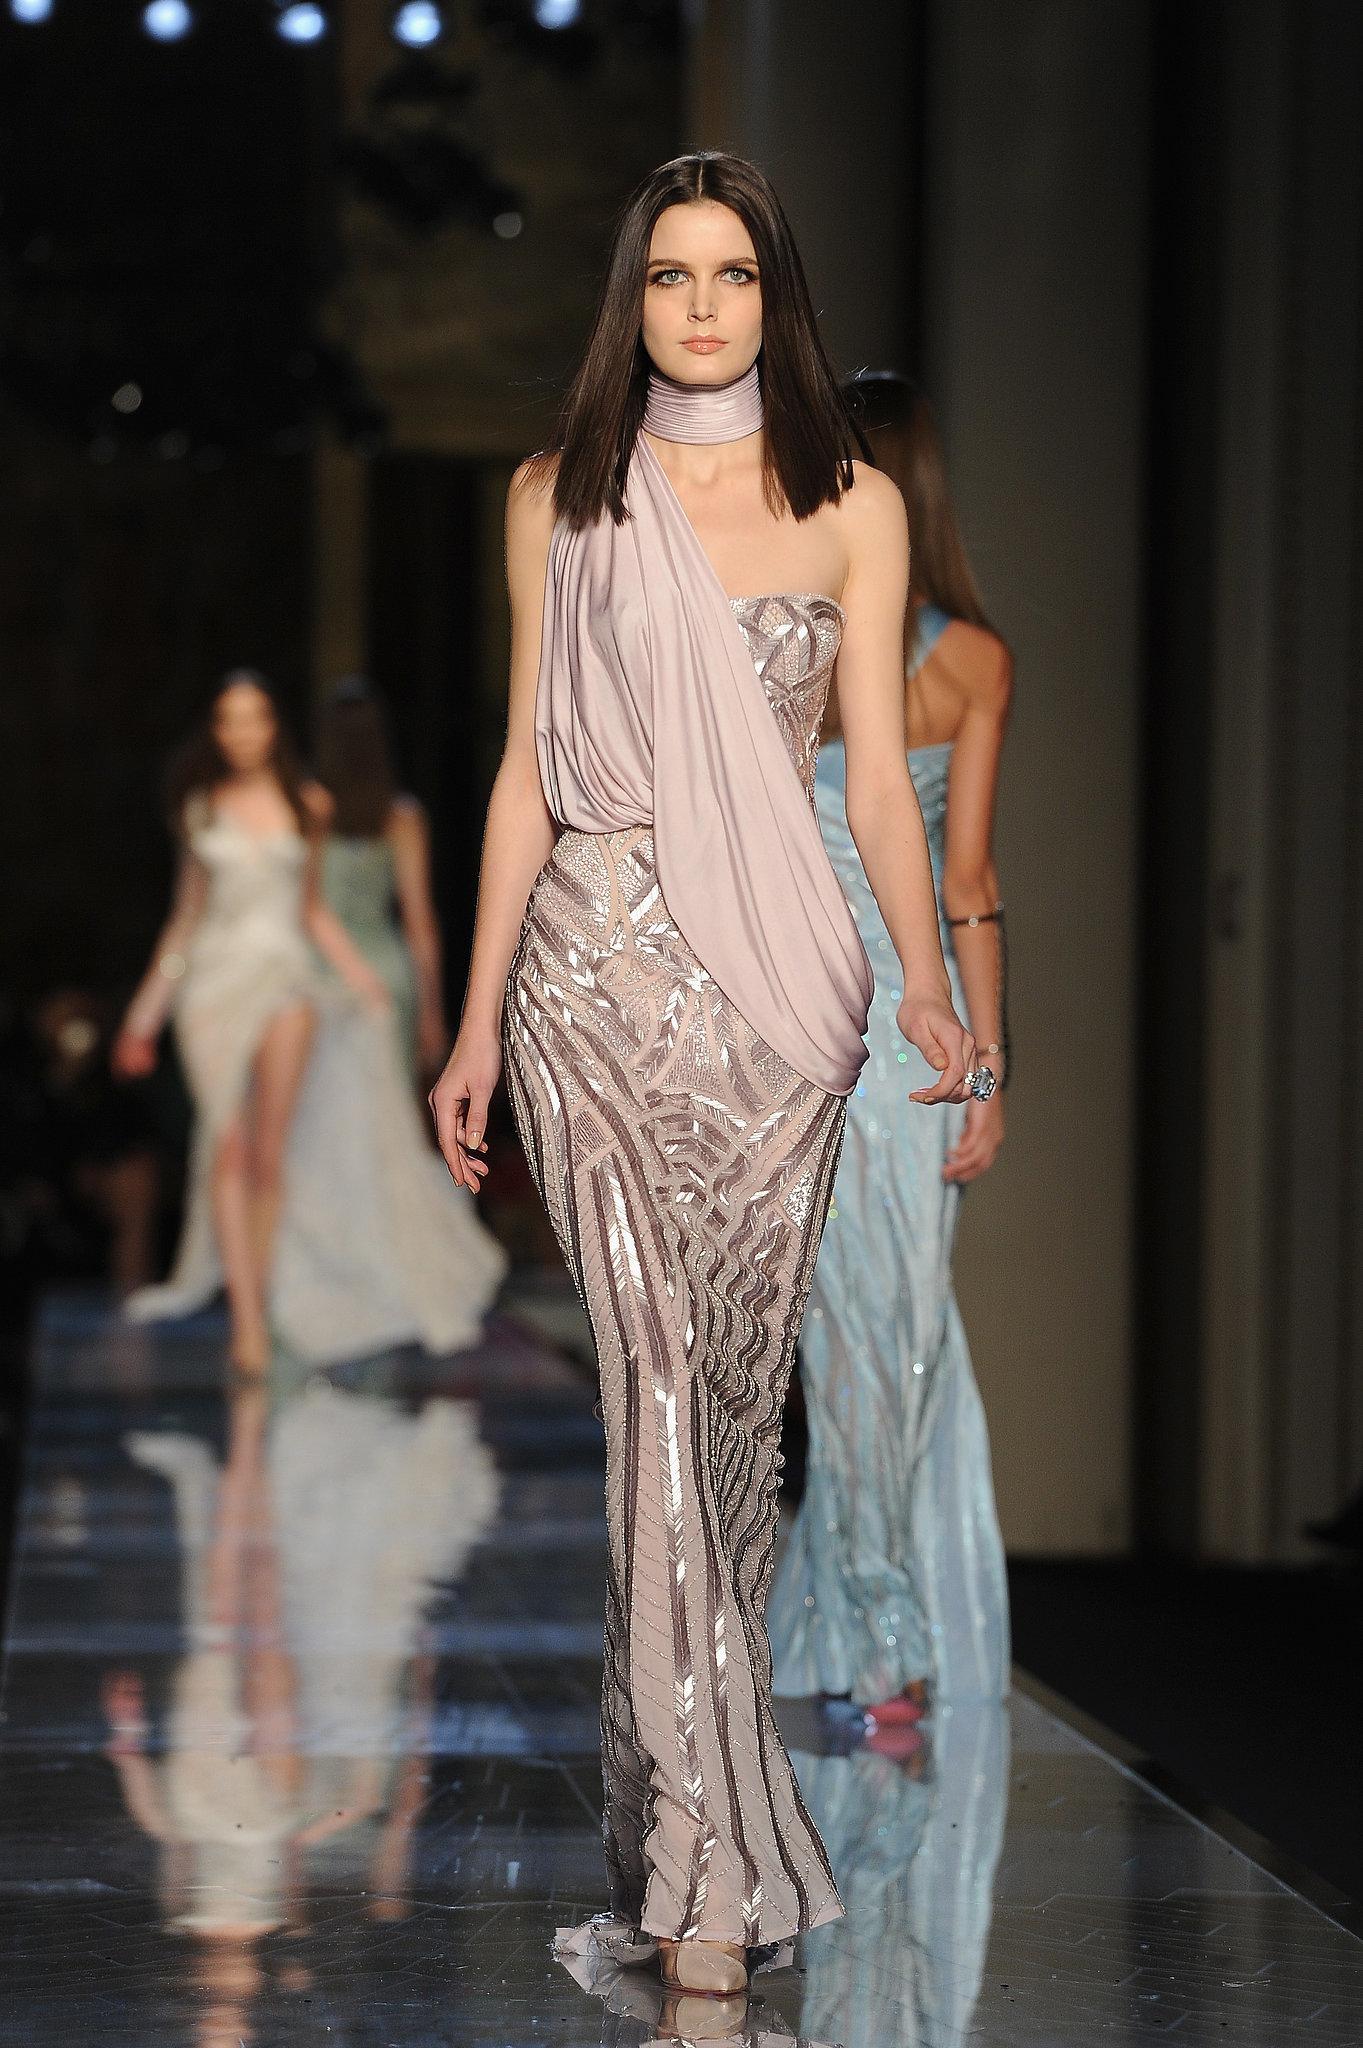 Atelier versace haute couture spring 2014 donatella has for The haute couture